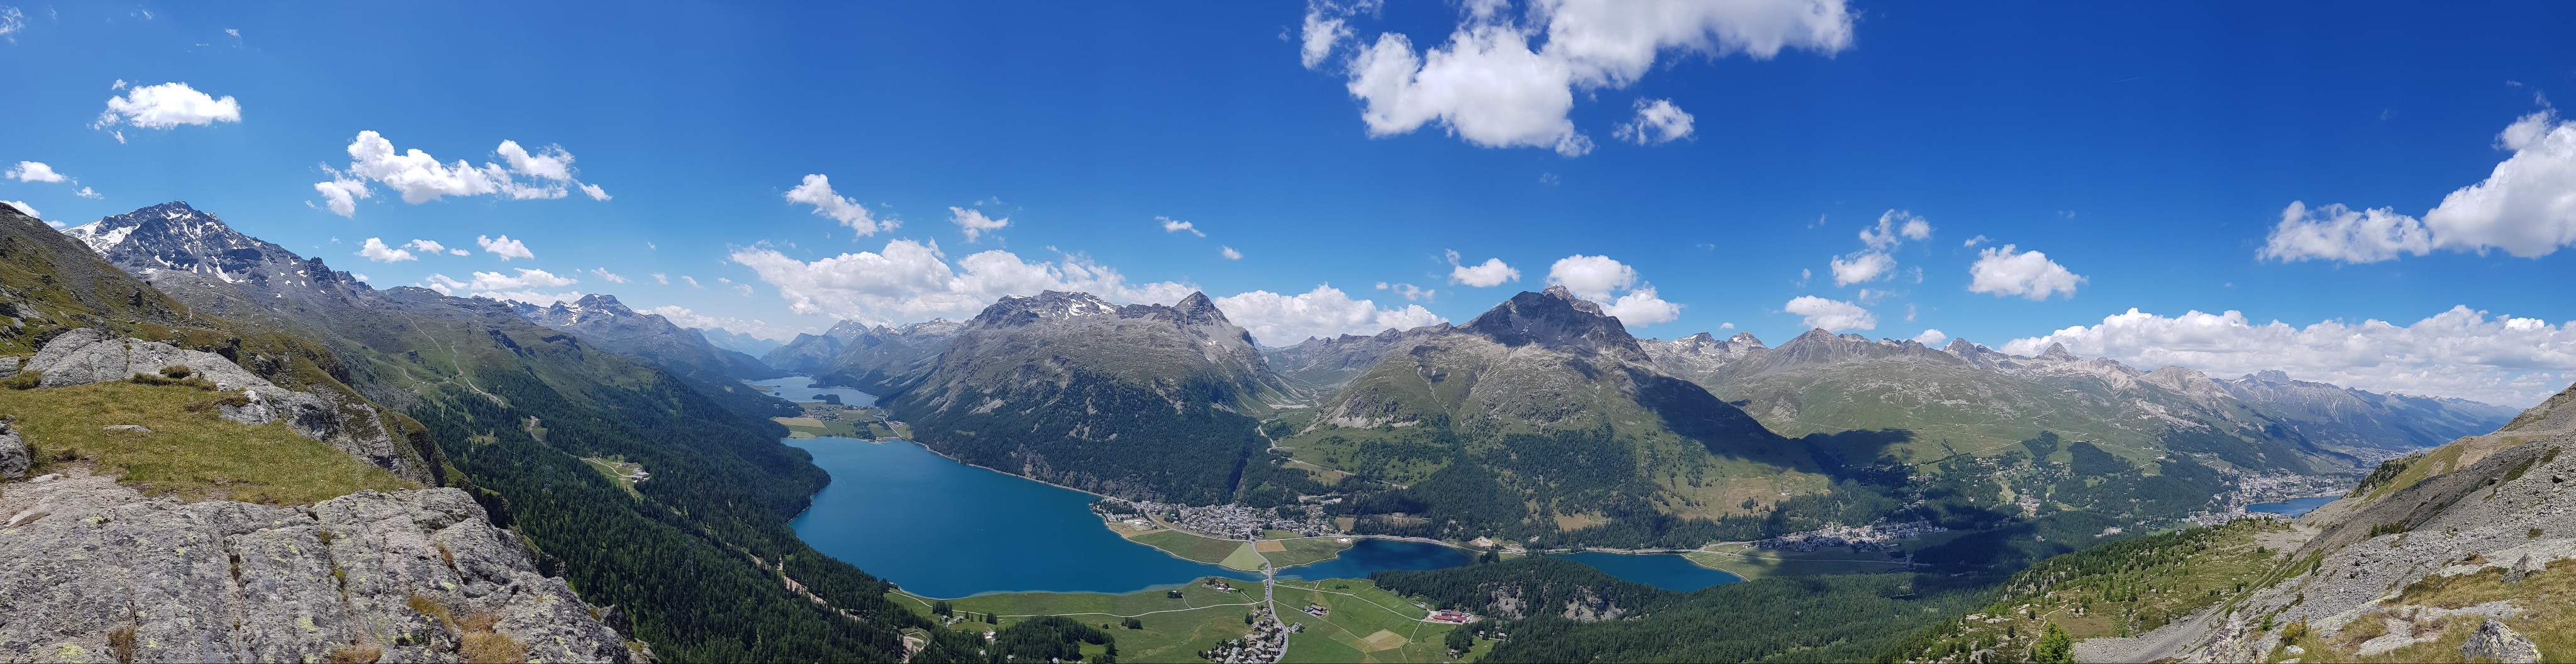 Engadine, Surlej, view on Surlej, Silvaplana, St. Moritzersee, Lej da Champfer, Lake Silvaplana, Lake Sils